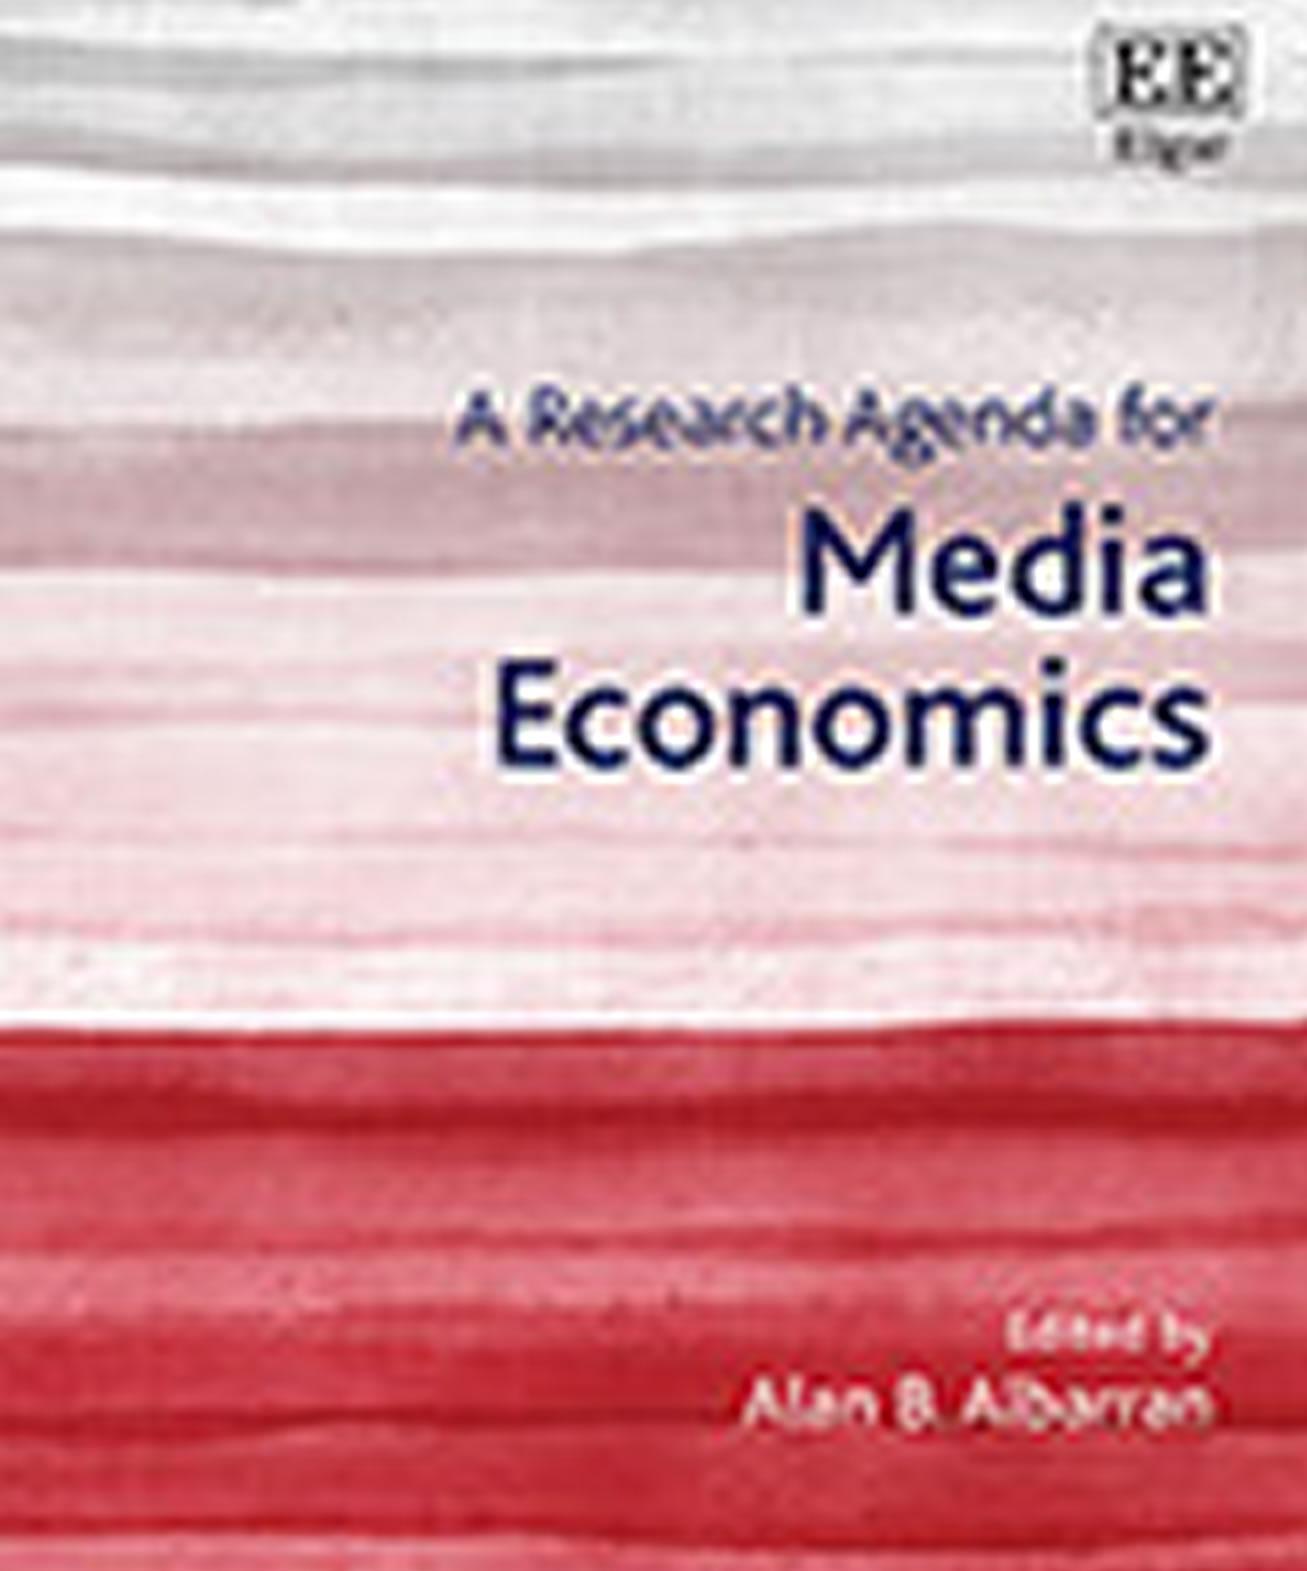 A research agenda for media economics: Media sustainability